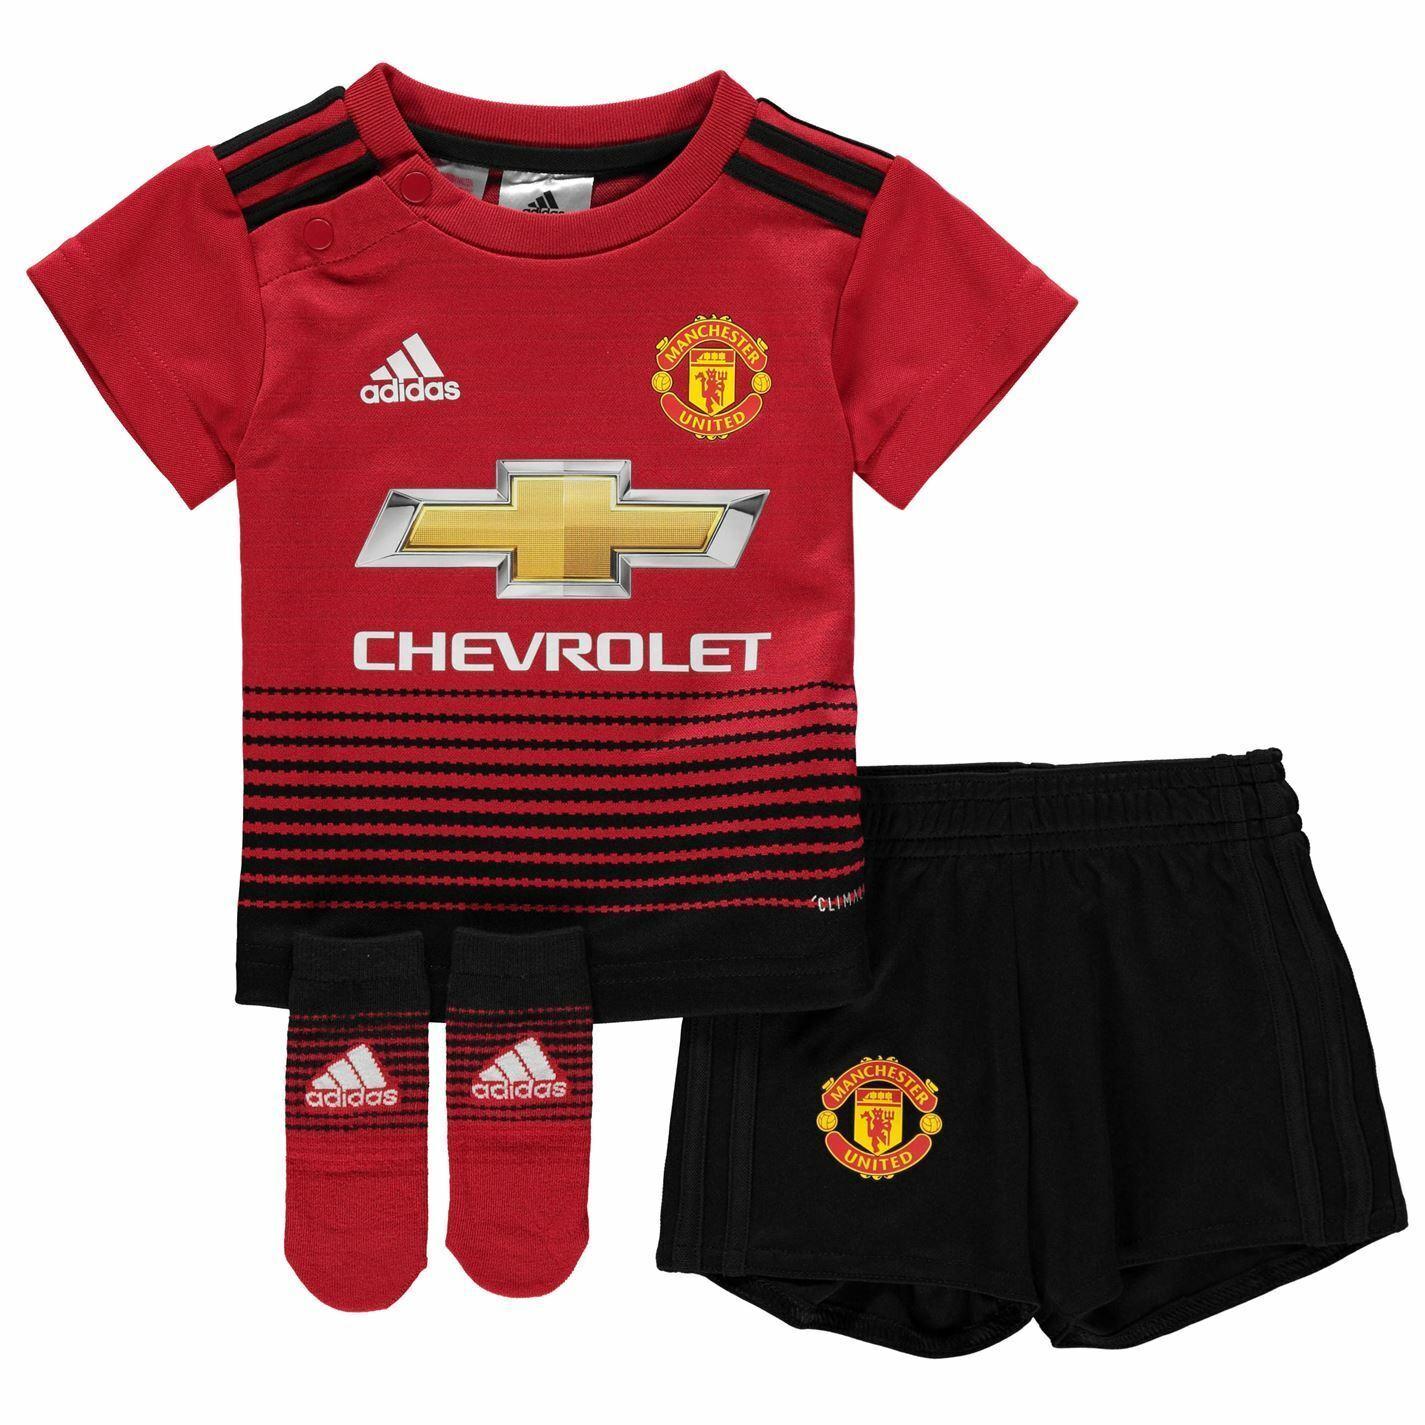 Adidas Manchester United Casa Bambino Kit 2018 19 Neonati rojo Calcio Strip